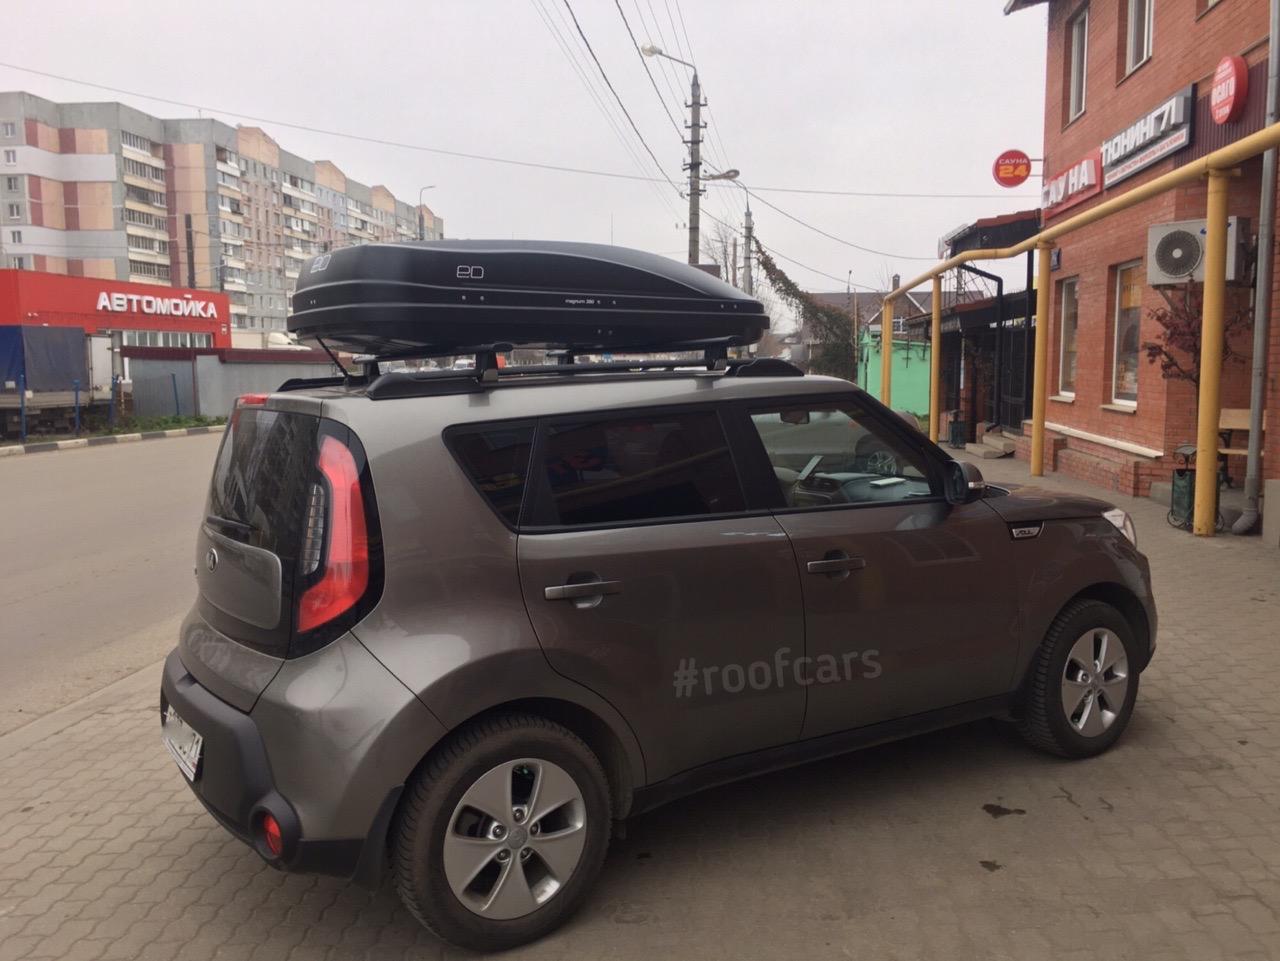 Багажник и автобокс для KIA SOUL в Туле